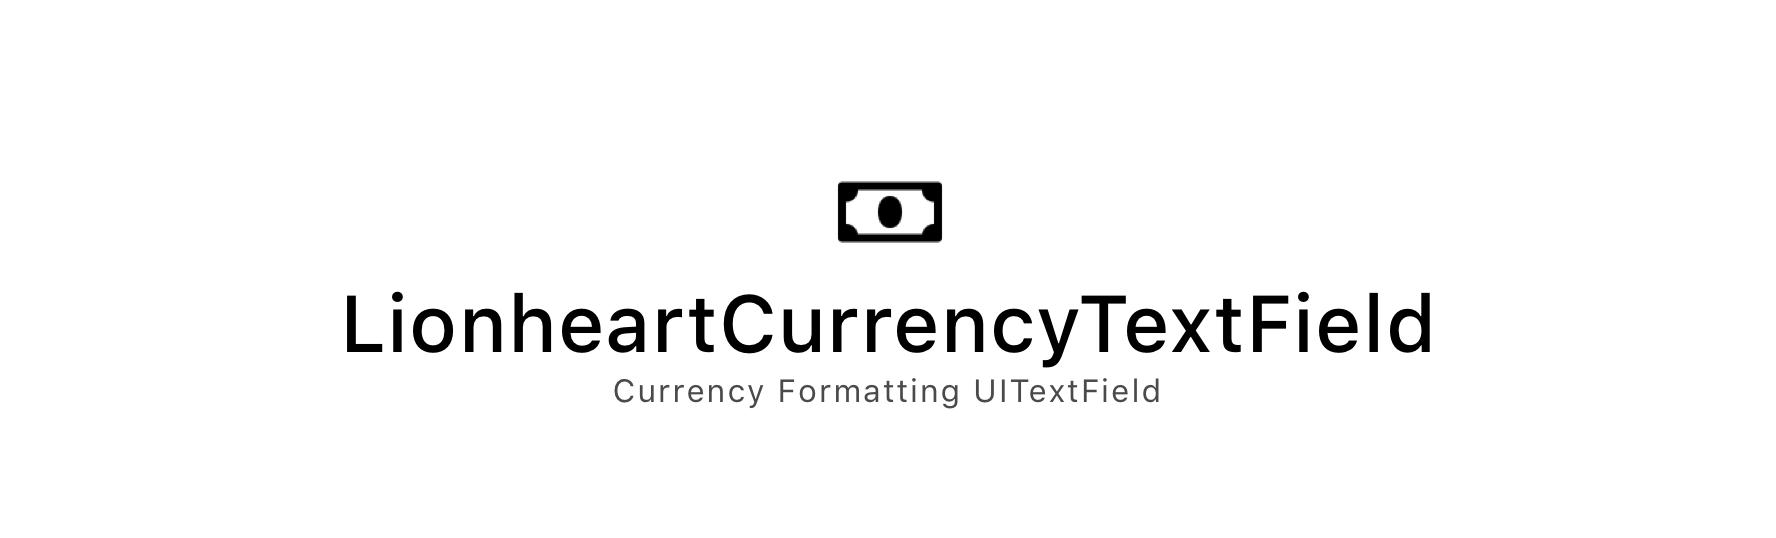 LionheartCurrencyTextField